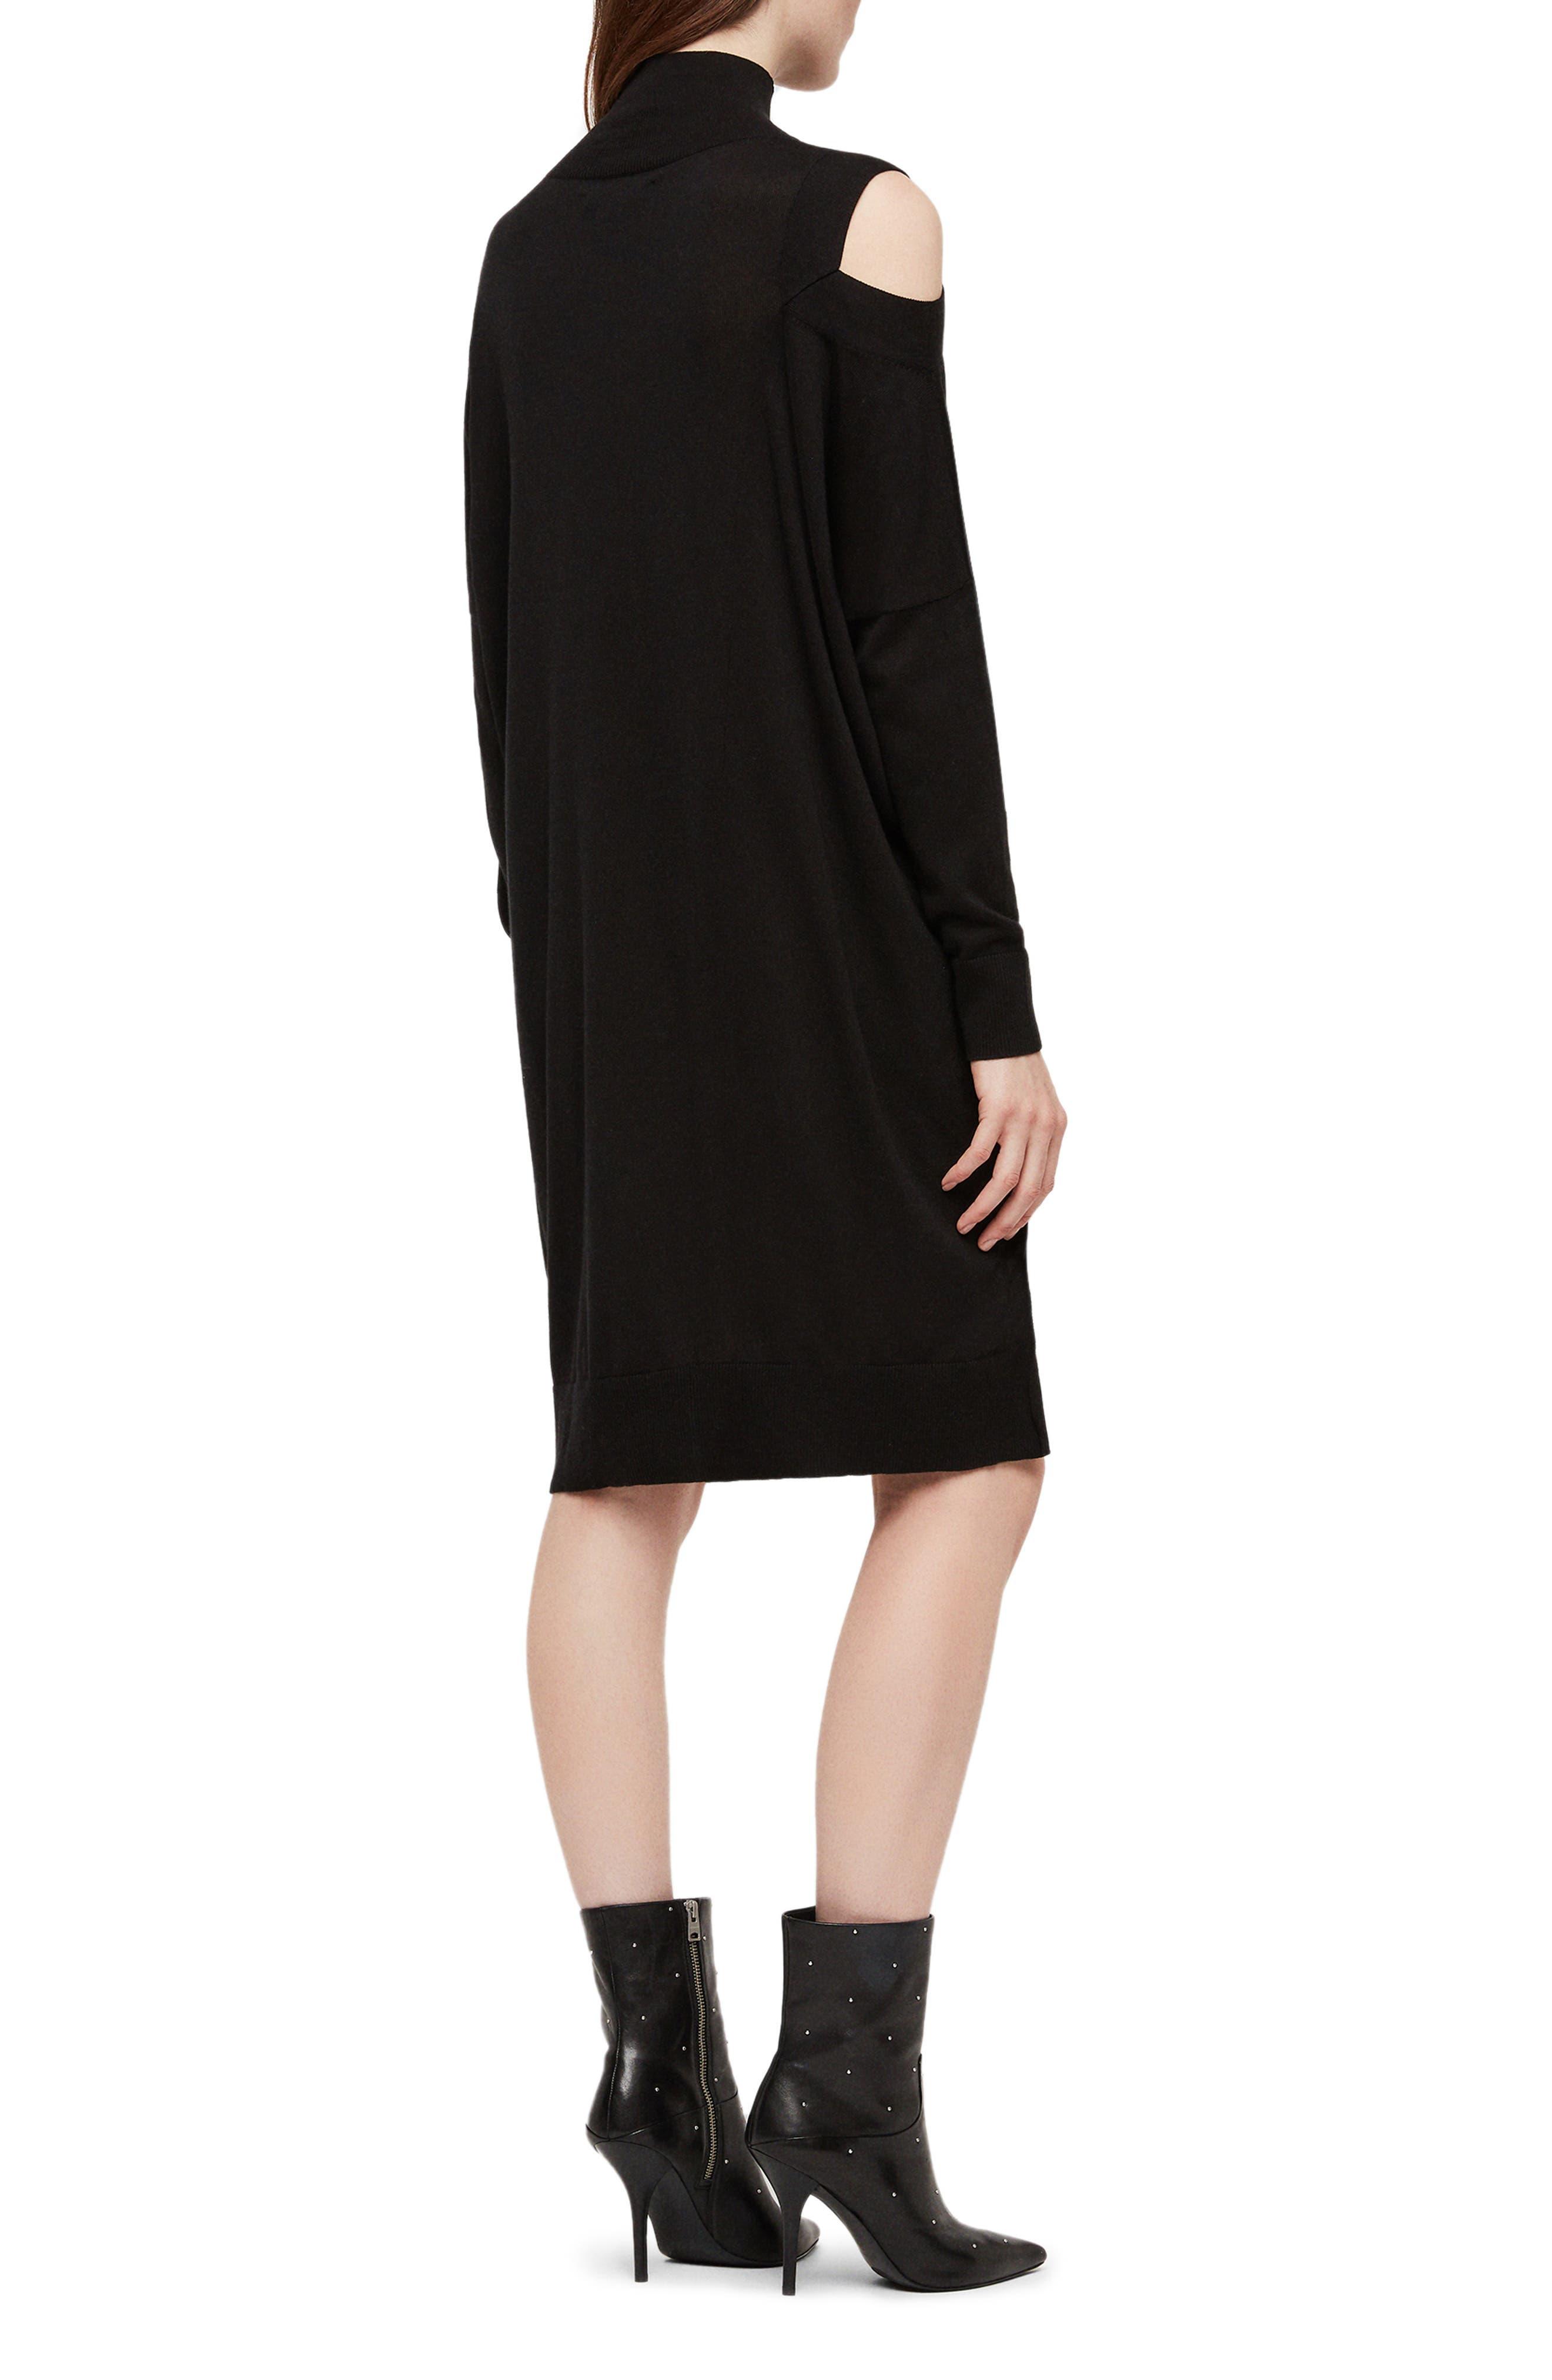 ALLSAINTS, Cecily Turtleneck Sweater Dress, Alternate thumbnail 2, color, BLACK